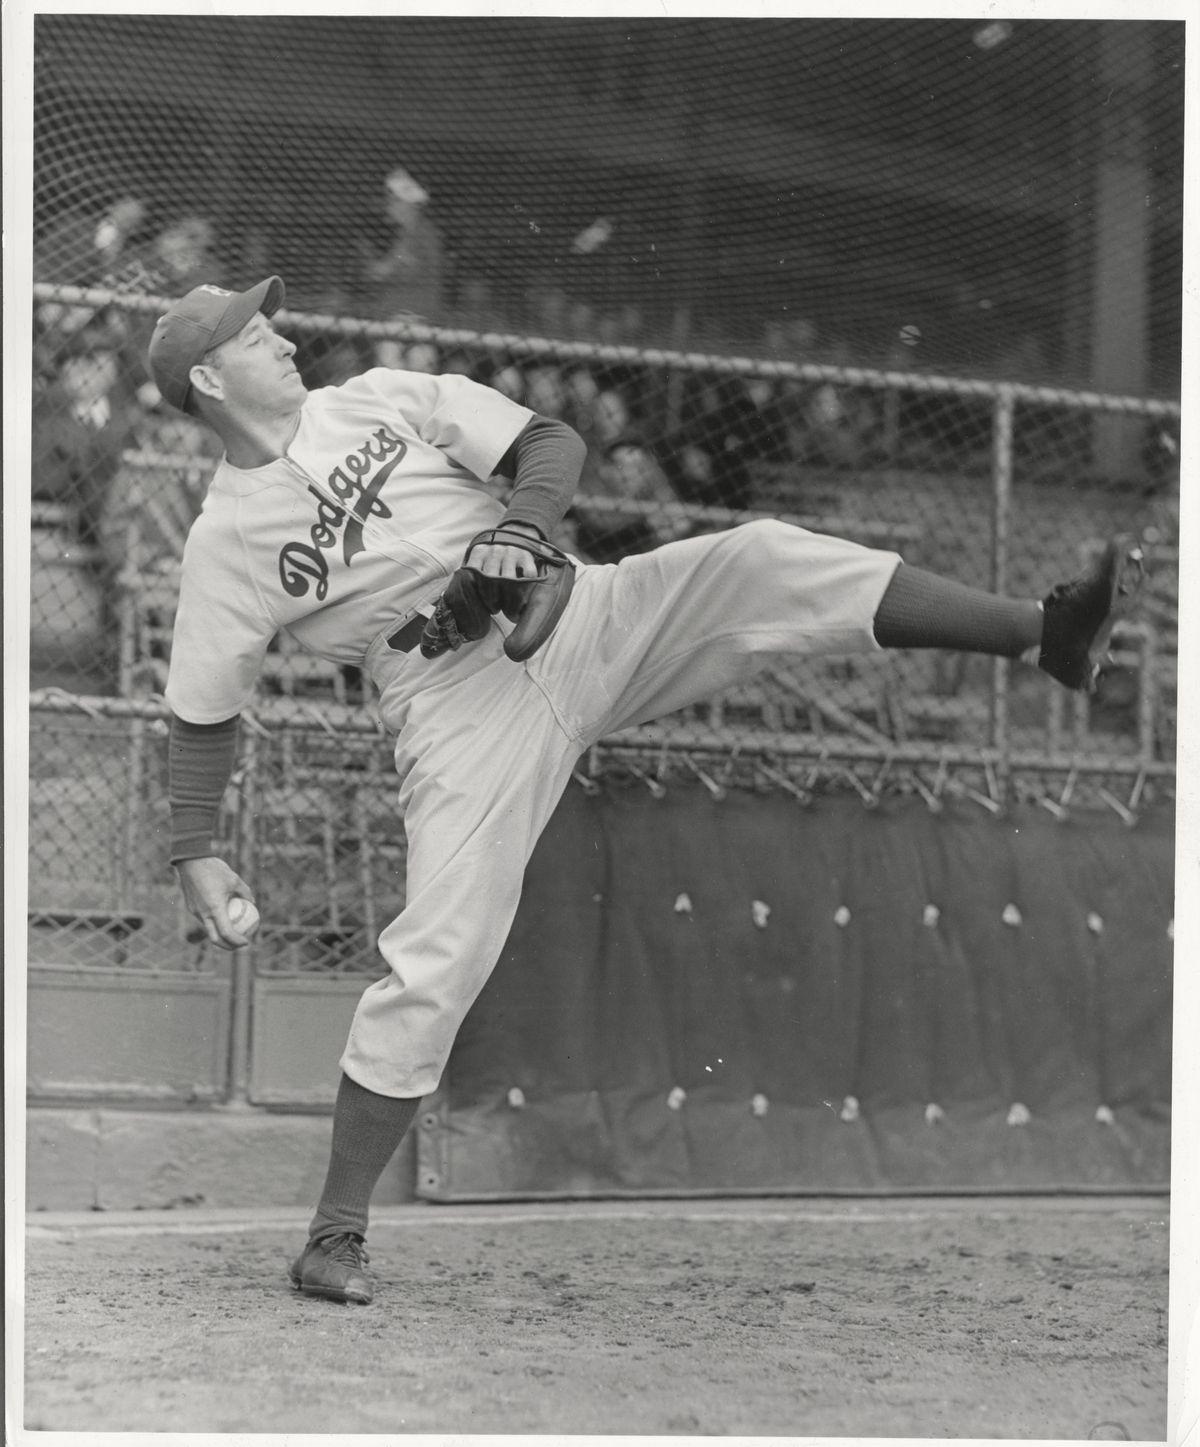 Whitlow Wyatt of the Brooklyn Dodgers